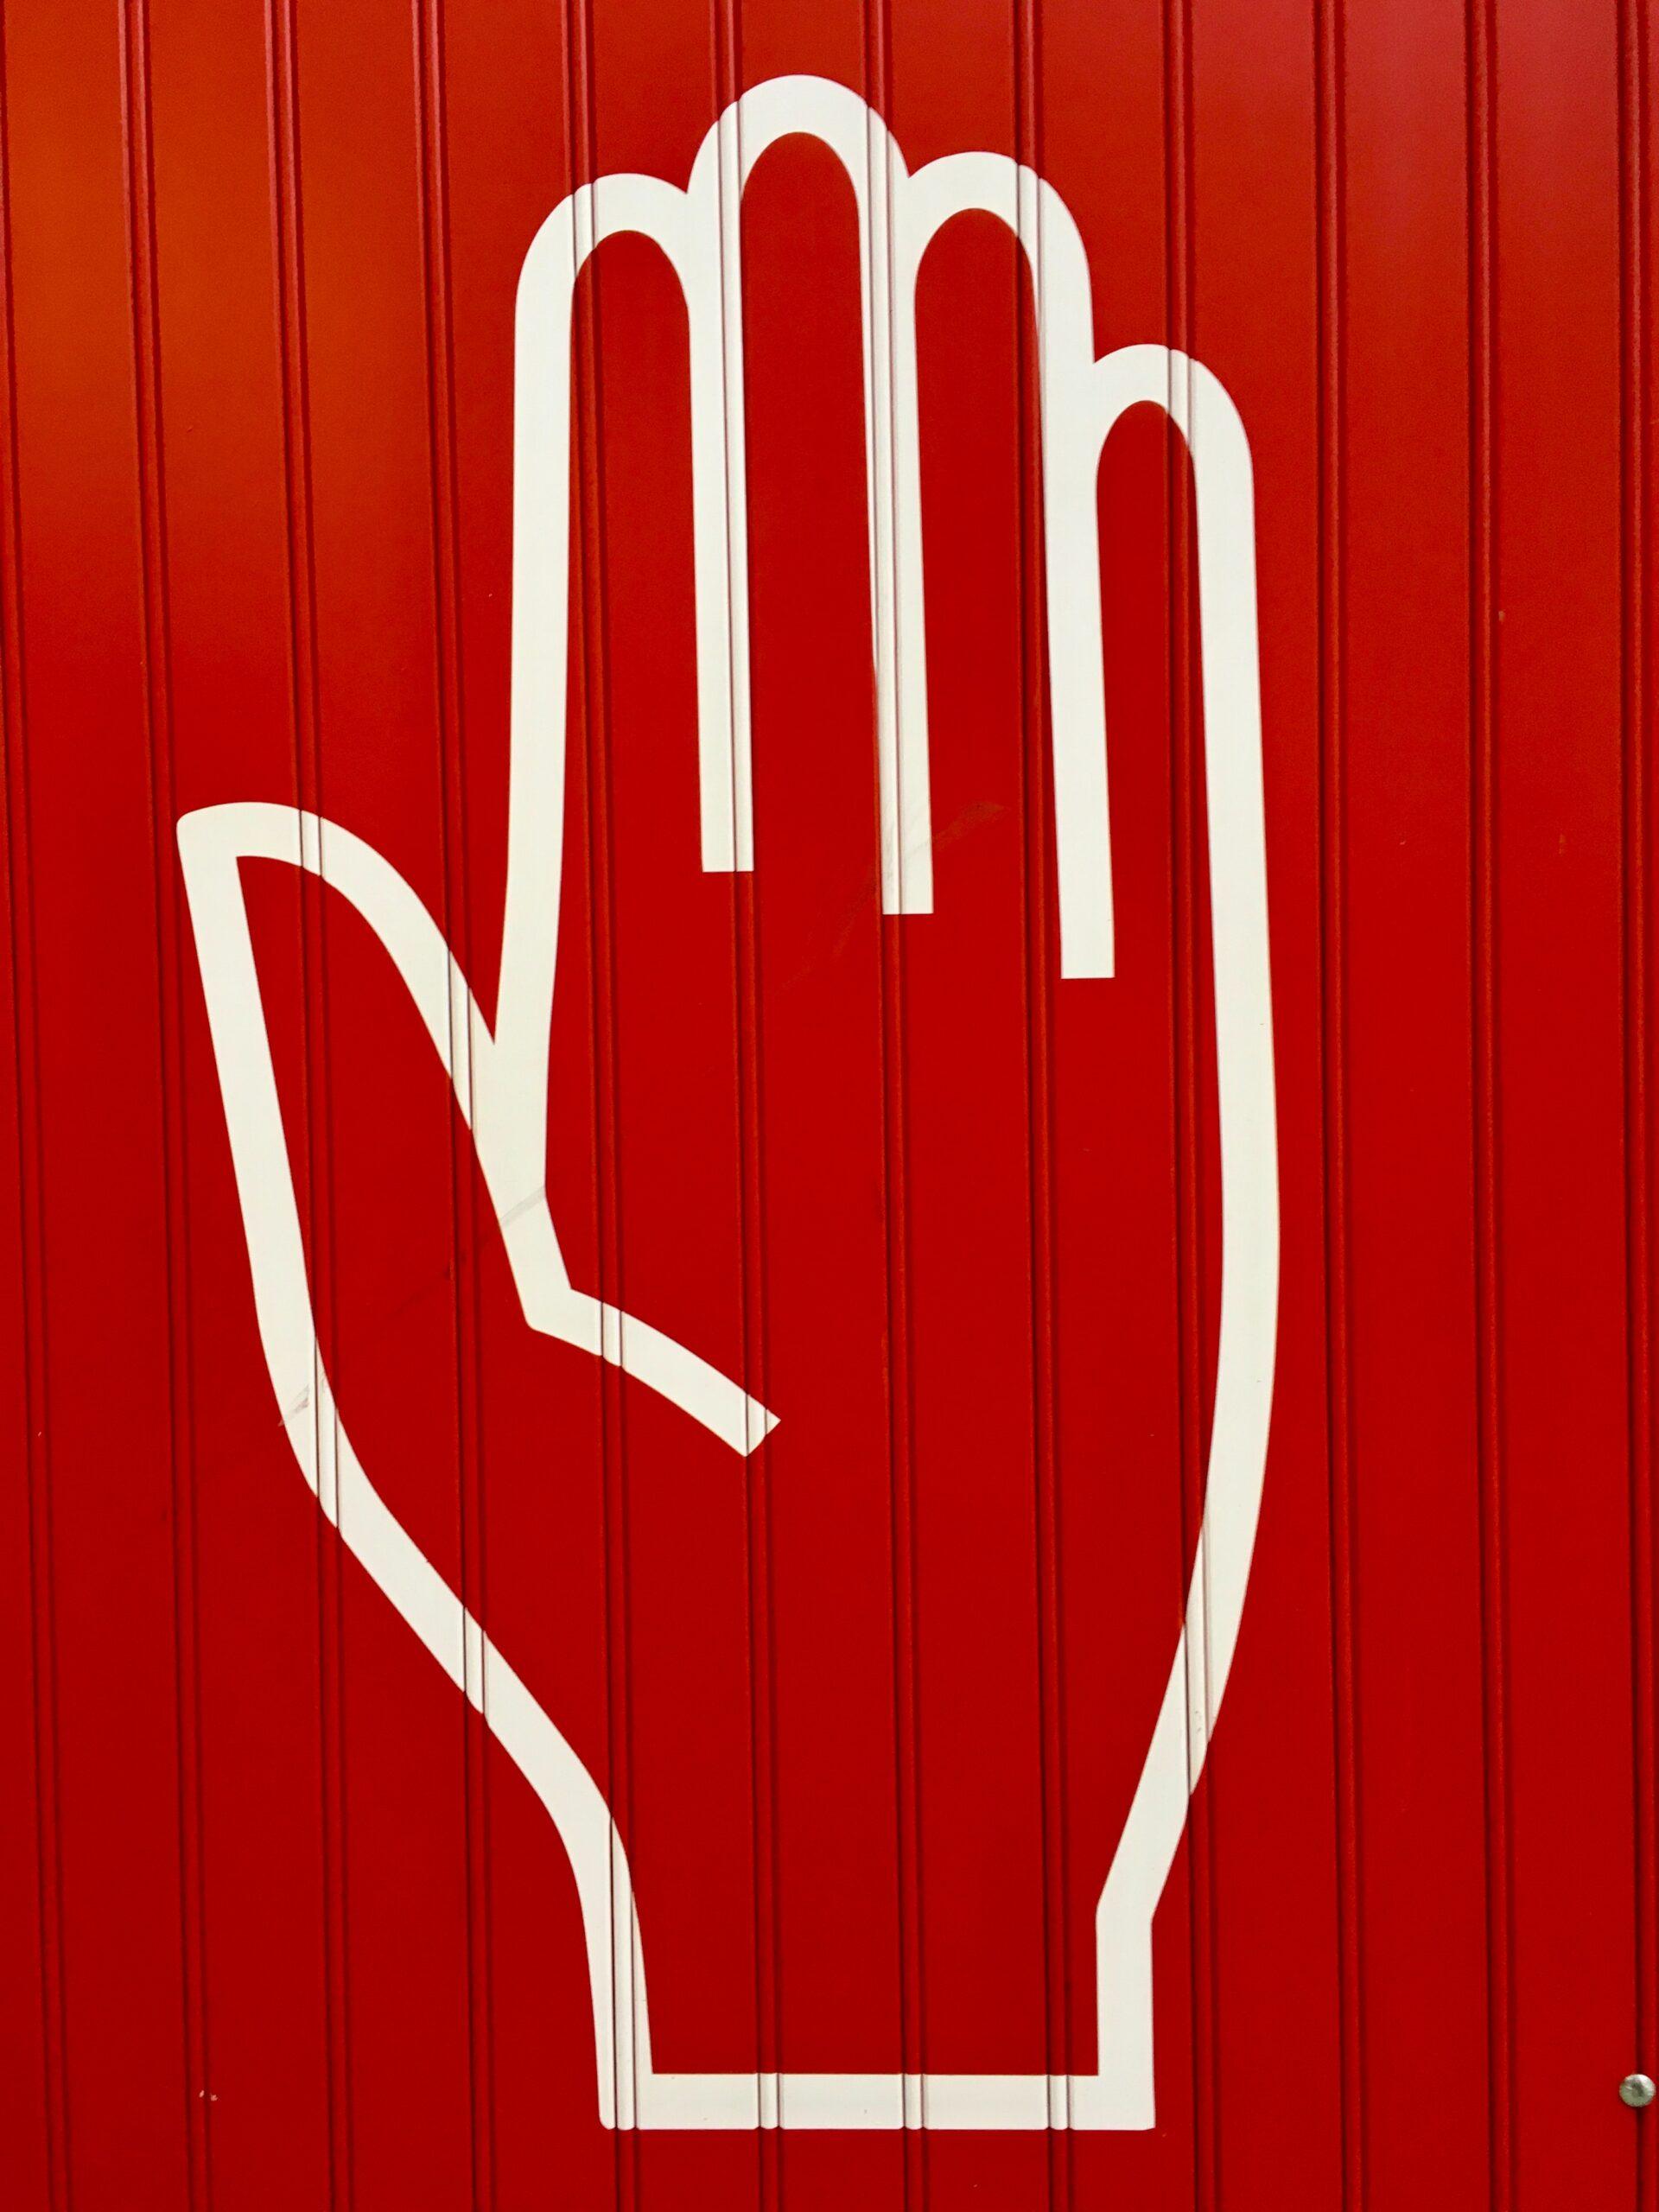 Marokko sluit luchruim